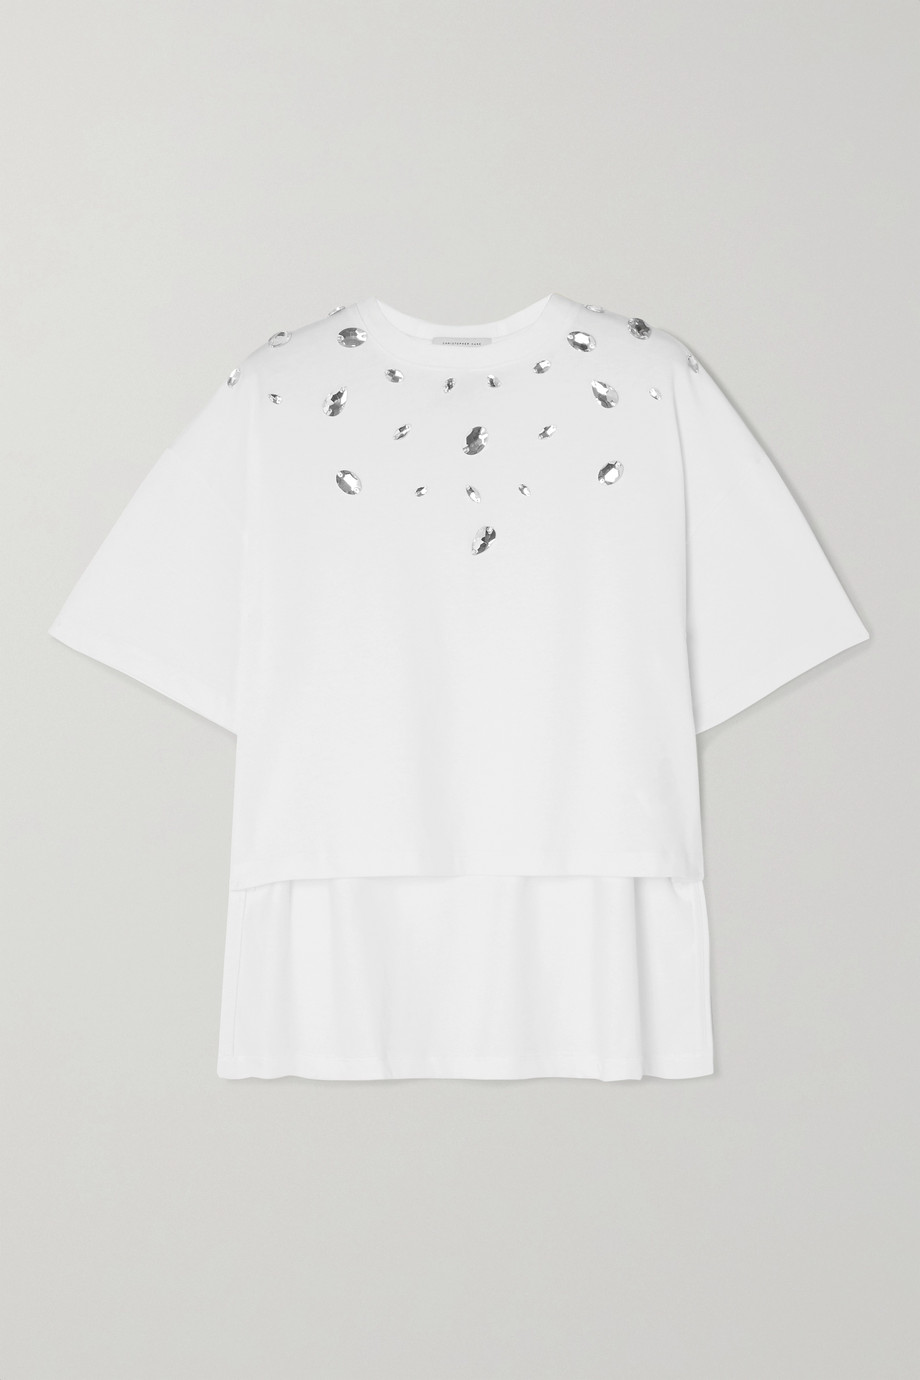 Christopher Kane Cropped crystal-embellished cotton-jersey T-shirt